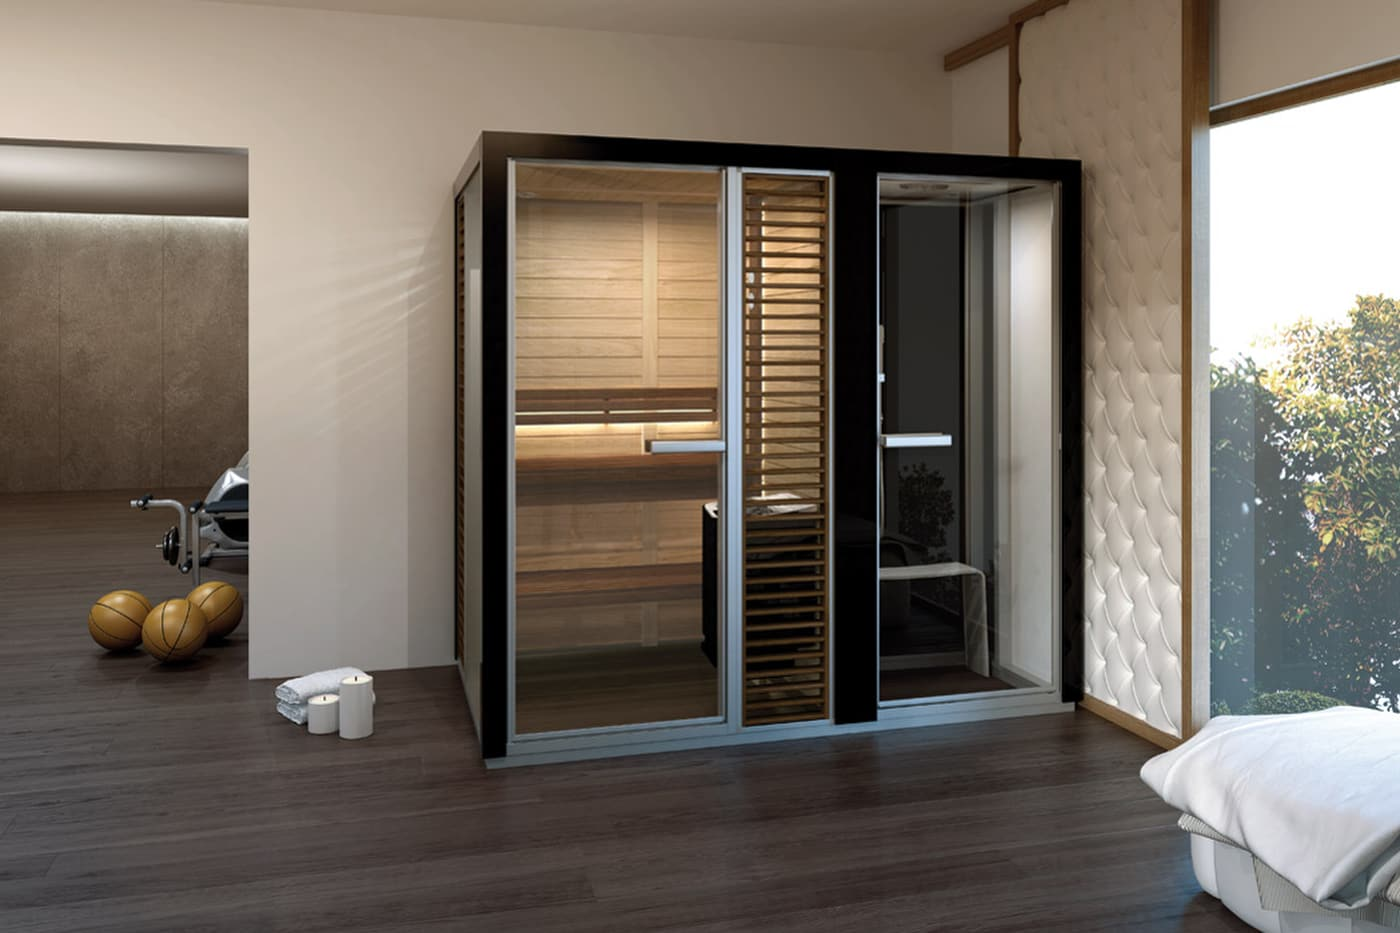 saunas-24-36-gal--201